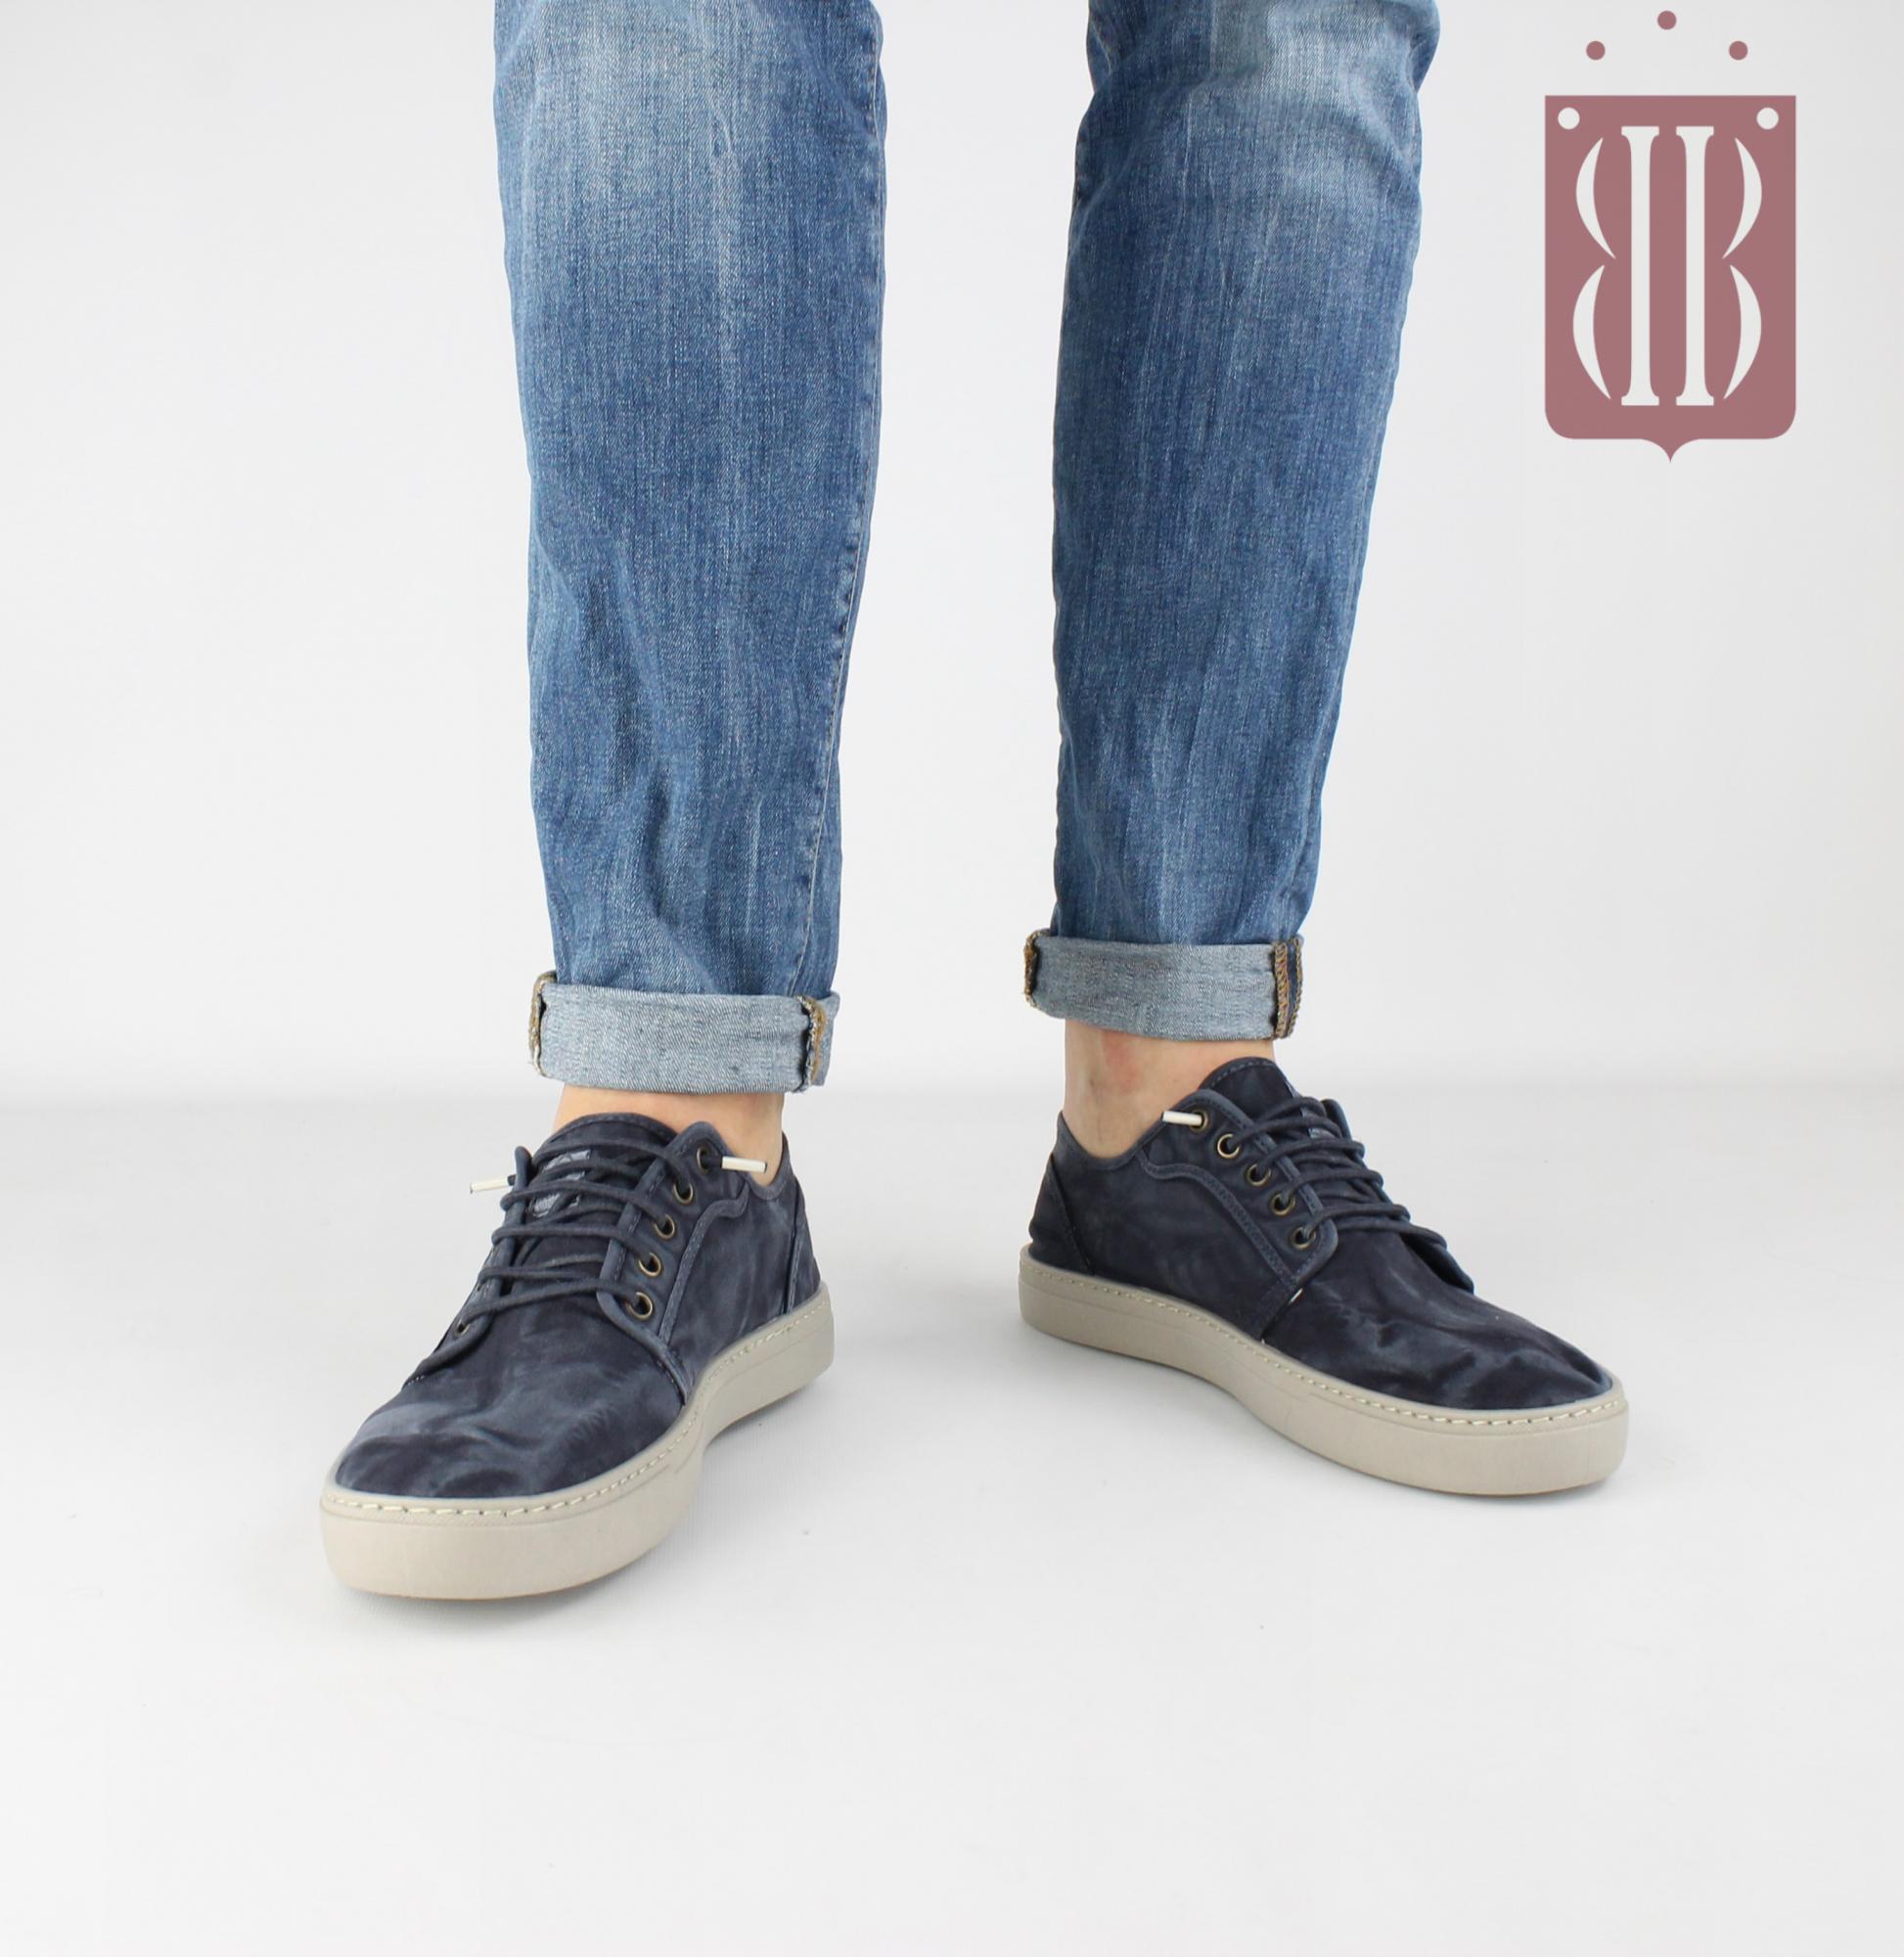 6b9bb89af6 NATURAL WORLD scarpe Unisex lacci Cotone Bio plantare estraibile vegan shoes